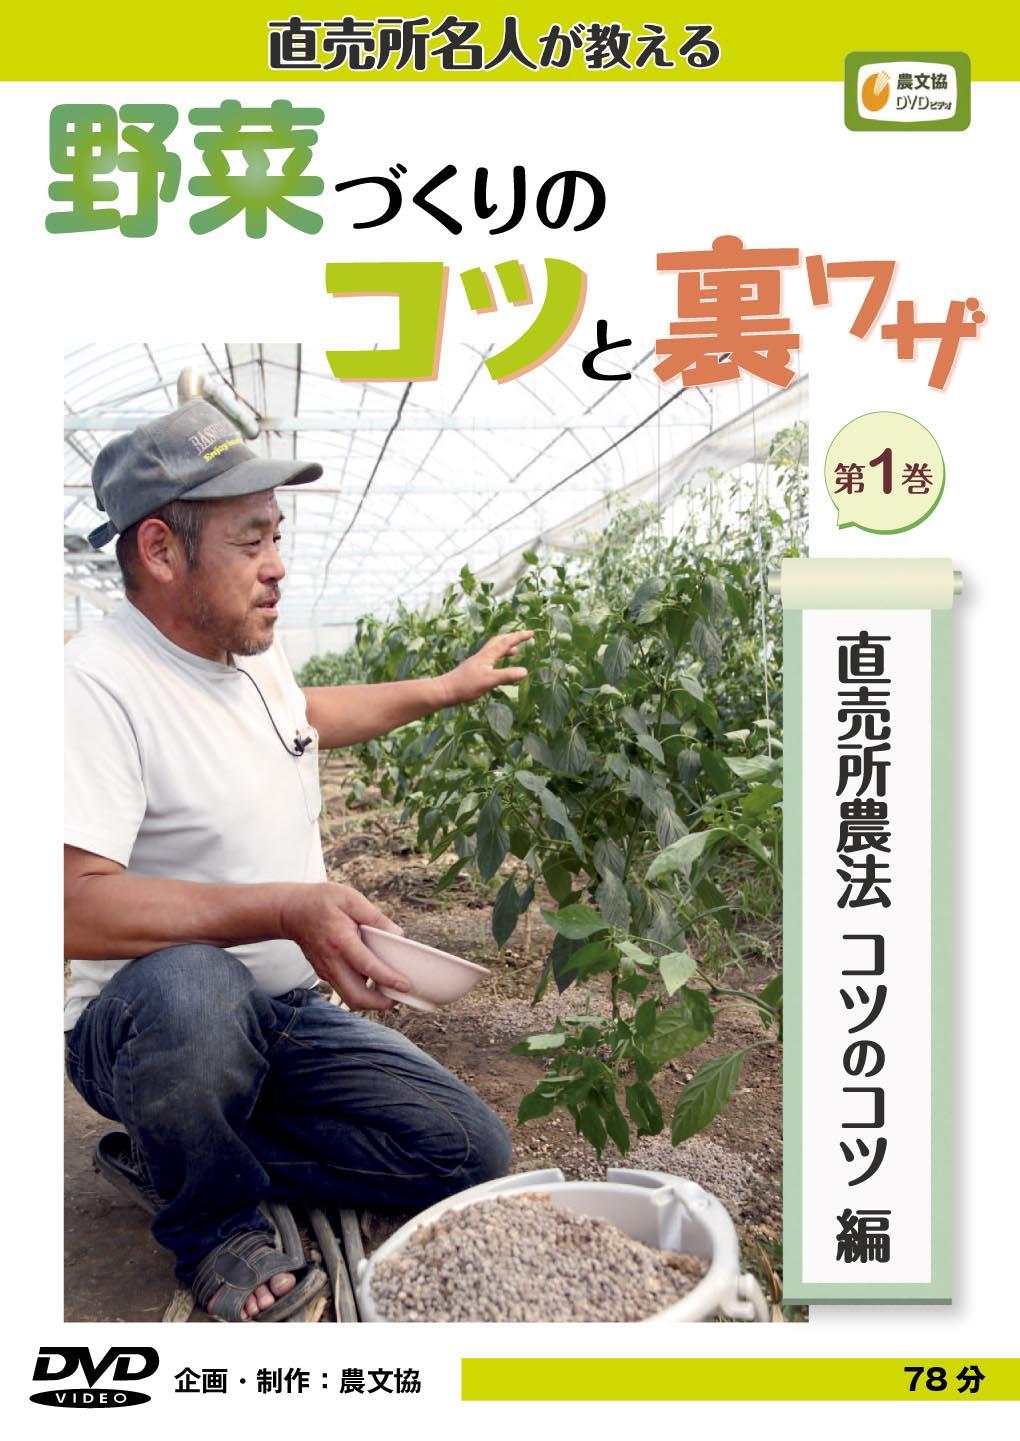 DVD 野菜づくりのコツと裏ワザ1 直売所農法コツのコツ編